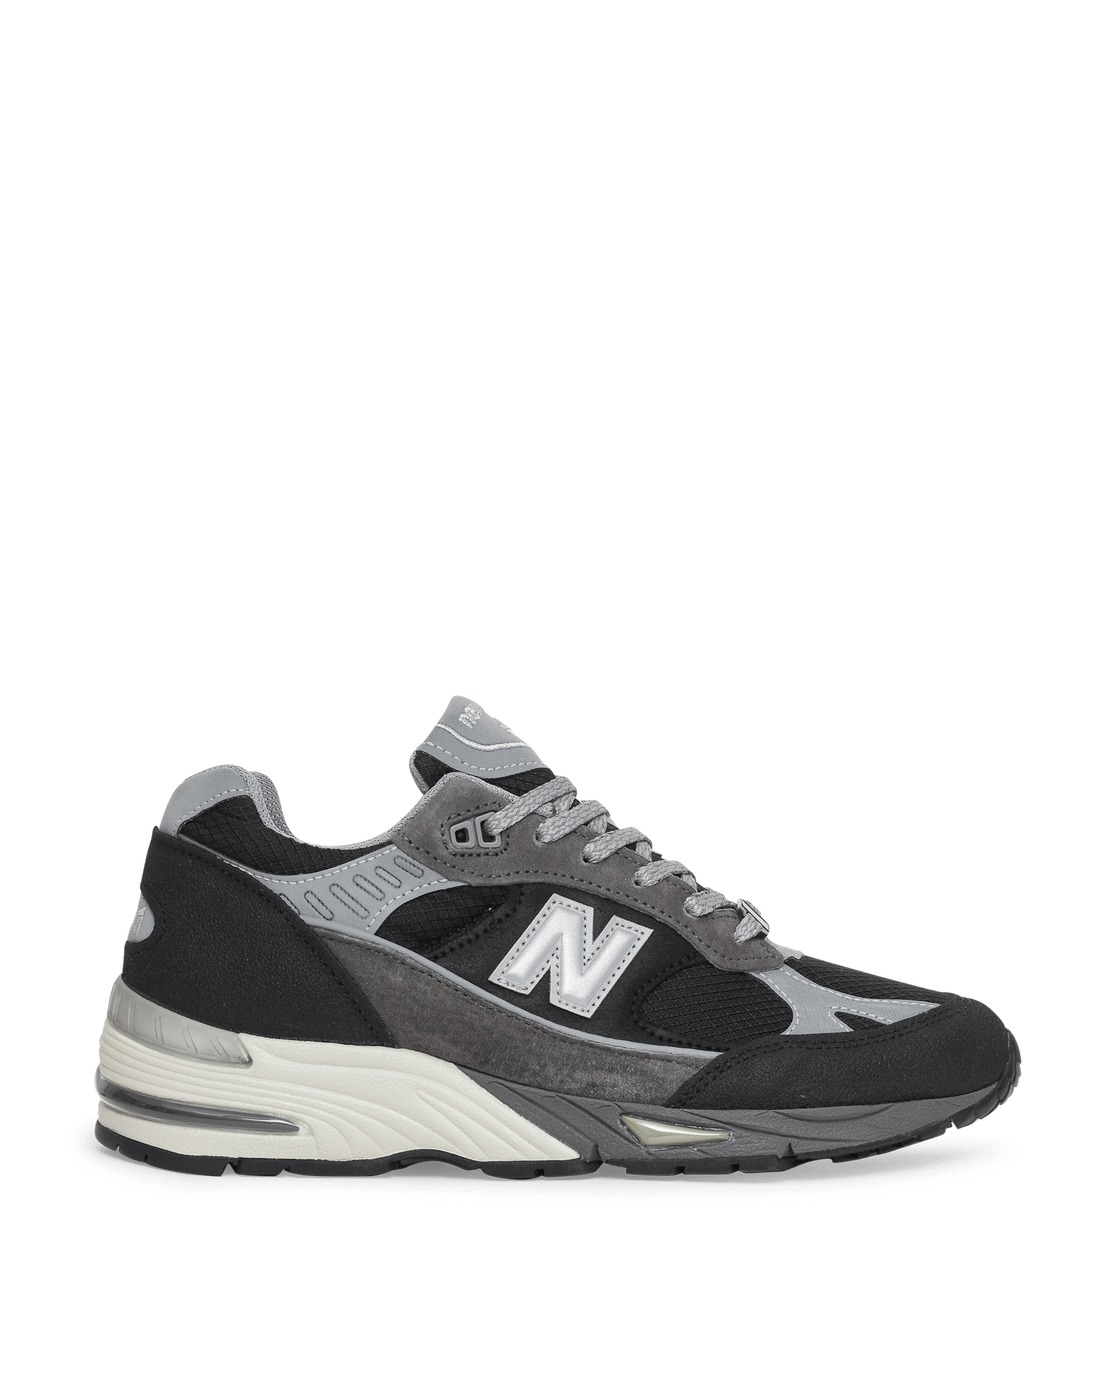 Photo: New Balance Slam Jam 991 Sneakers